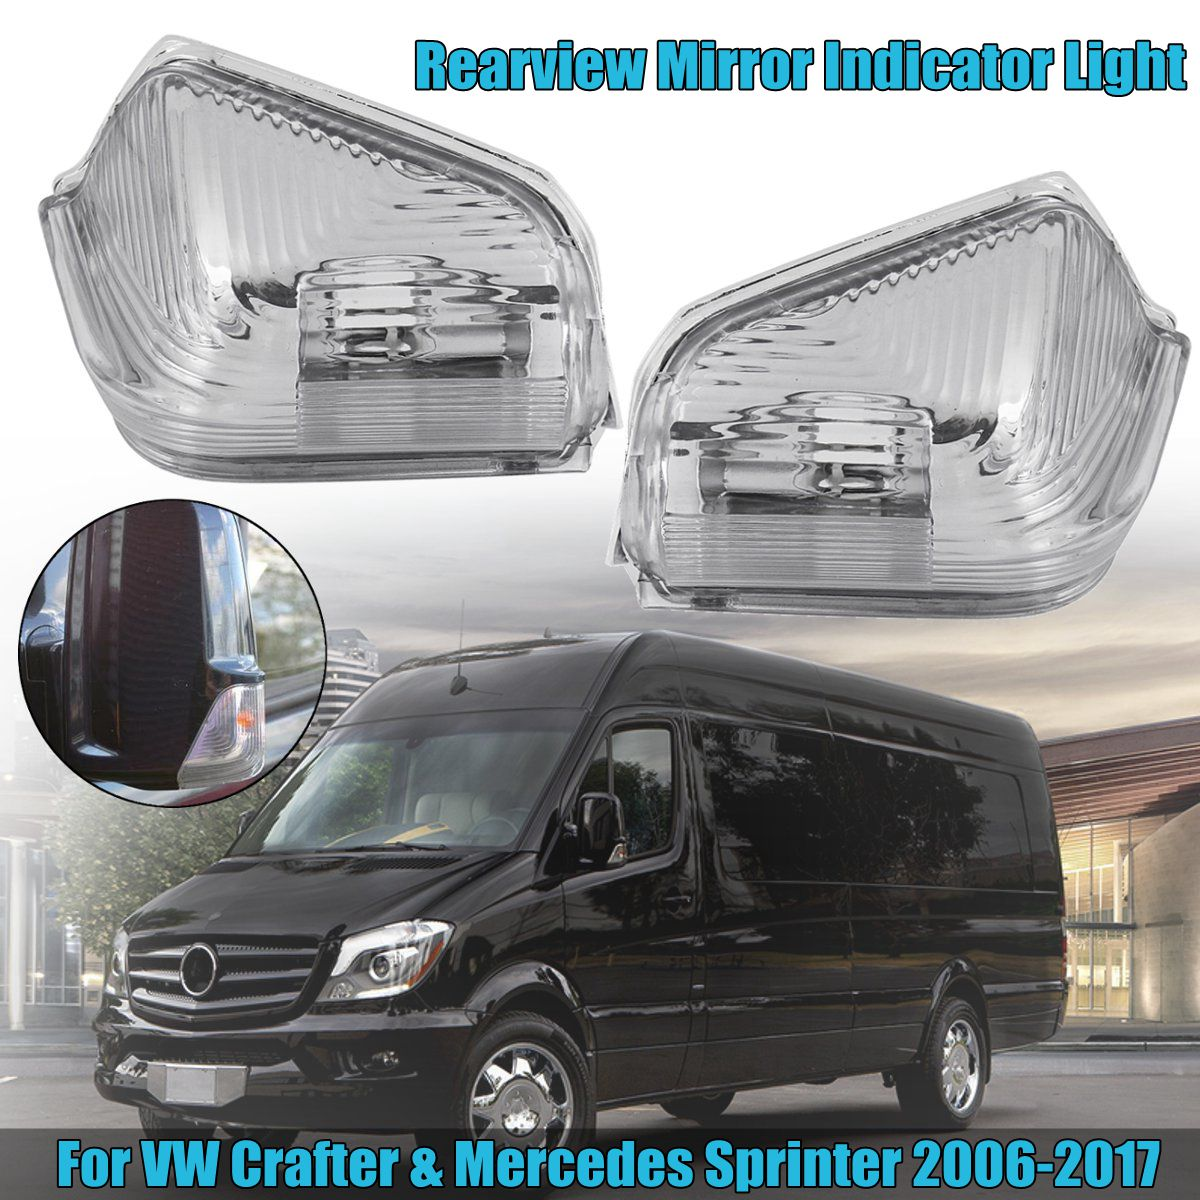 MERCEDES CITAN 109 COMPACT 12/> BLACK HEAVY DUTY WATERPROOF SEAT COVERS X2 FRONT